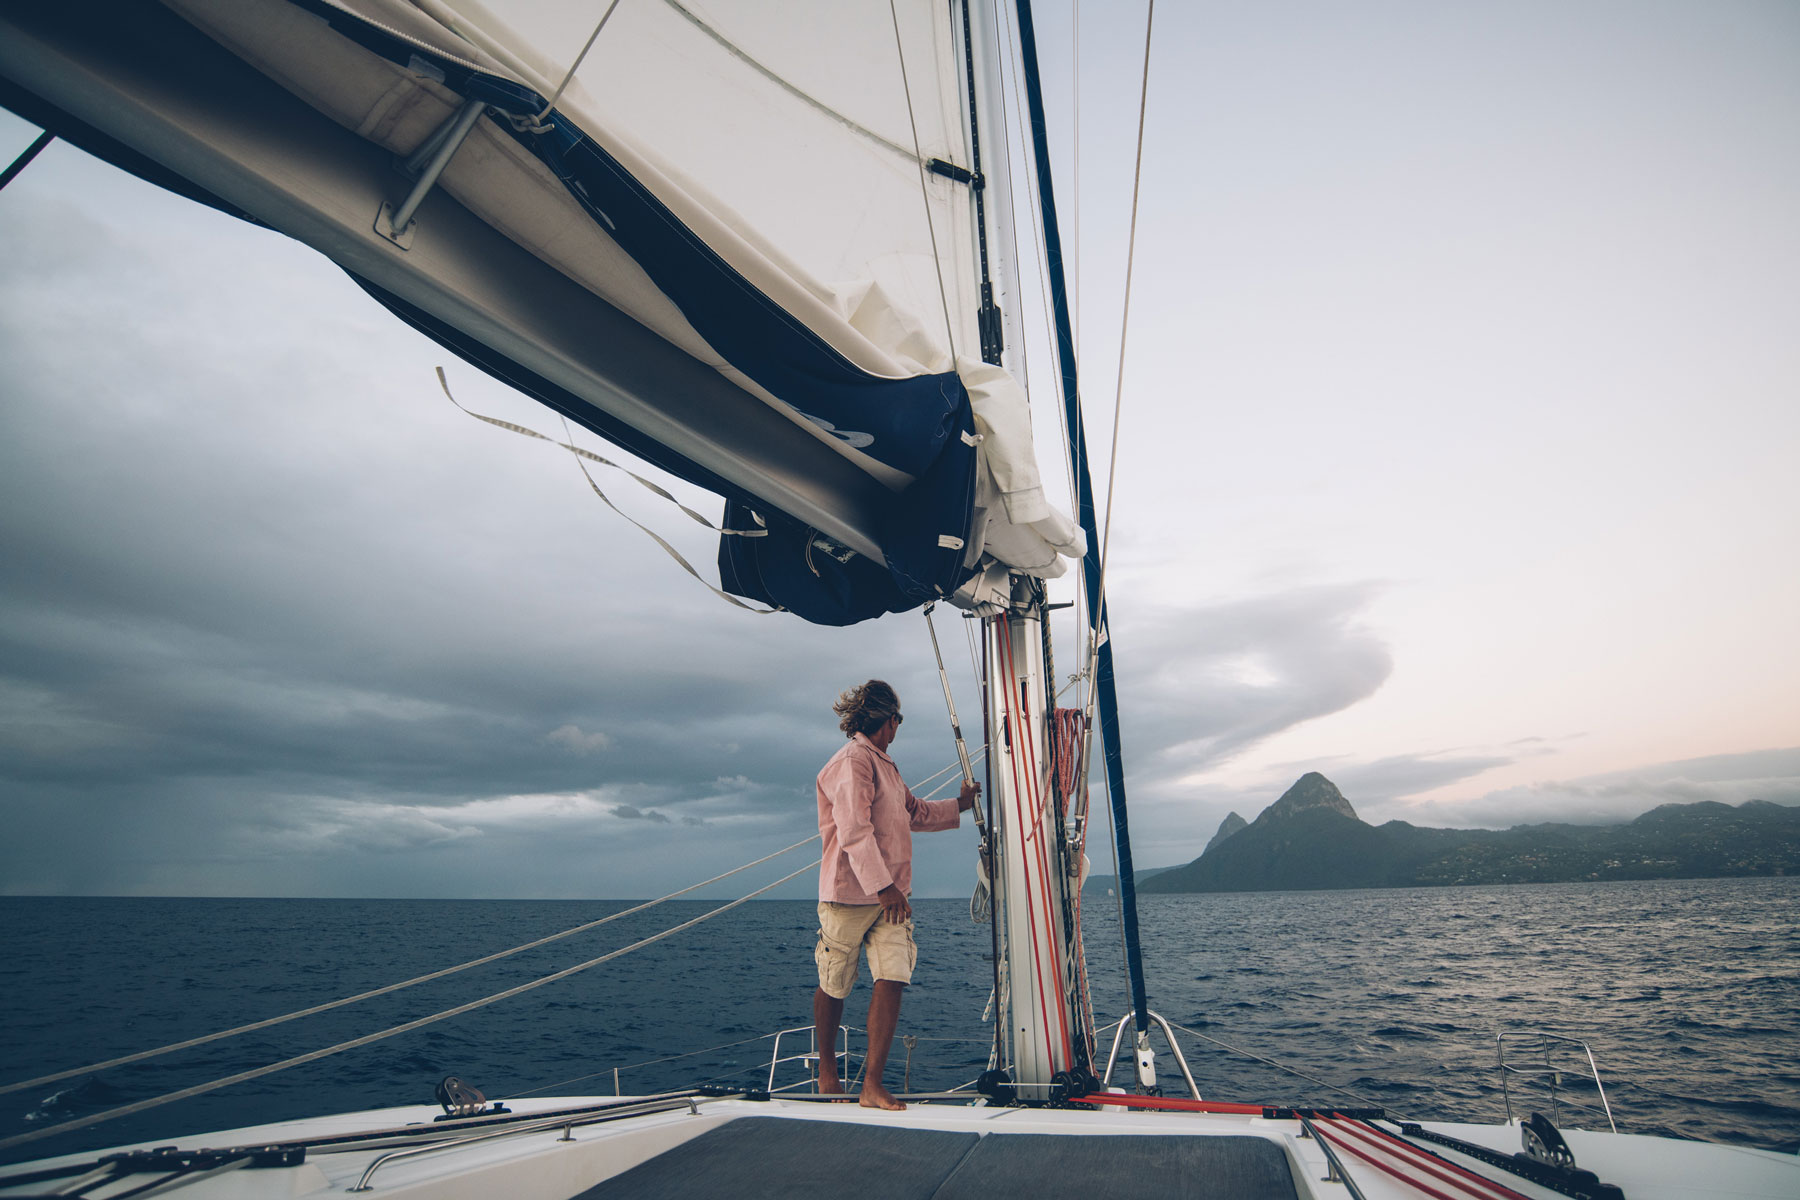 Croisière Catamaran, Les Grenadines et Sainte Lucie